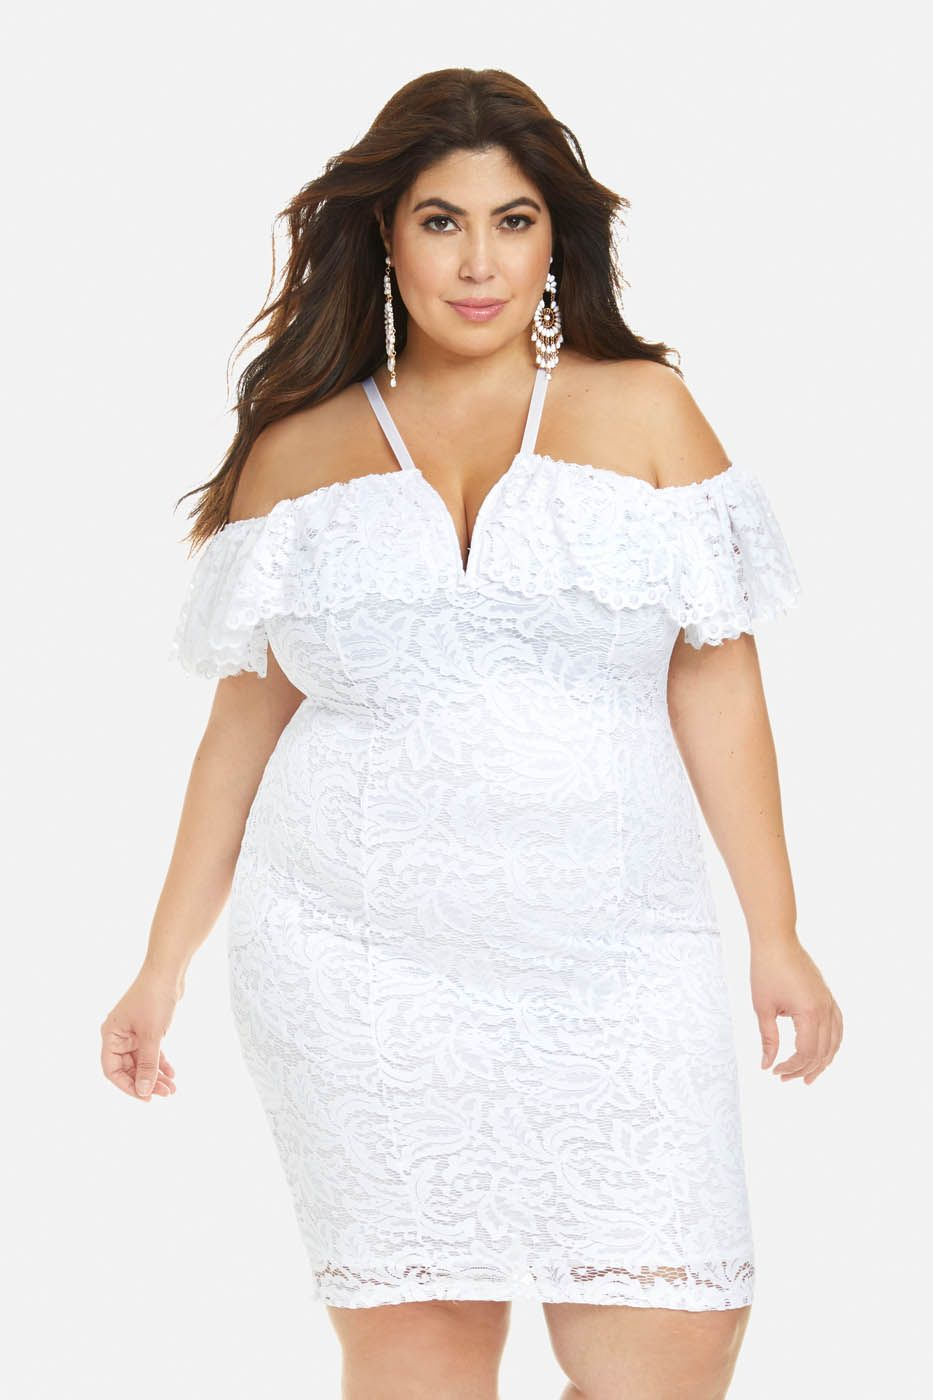 Plus Size Lilianna Off Shoulder Lace Bodycon Dress Girls